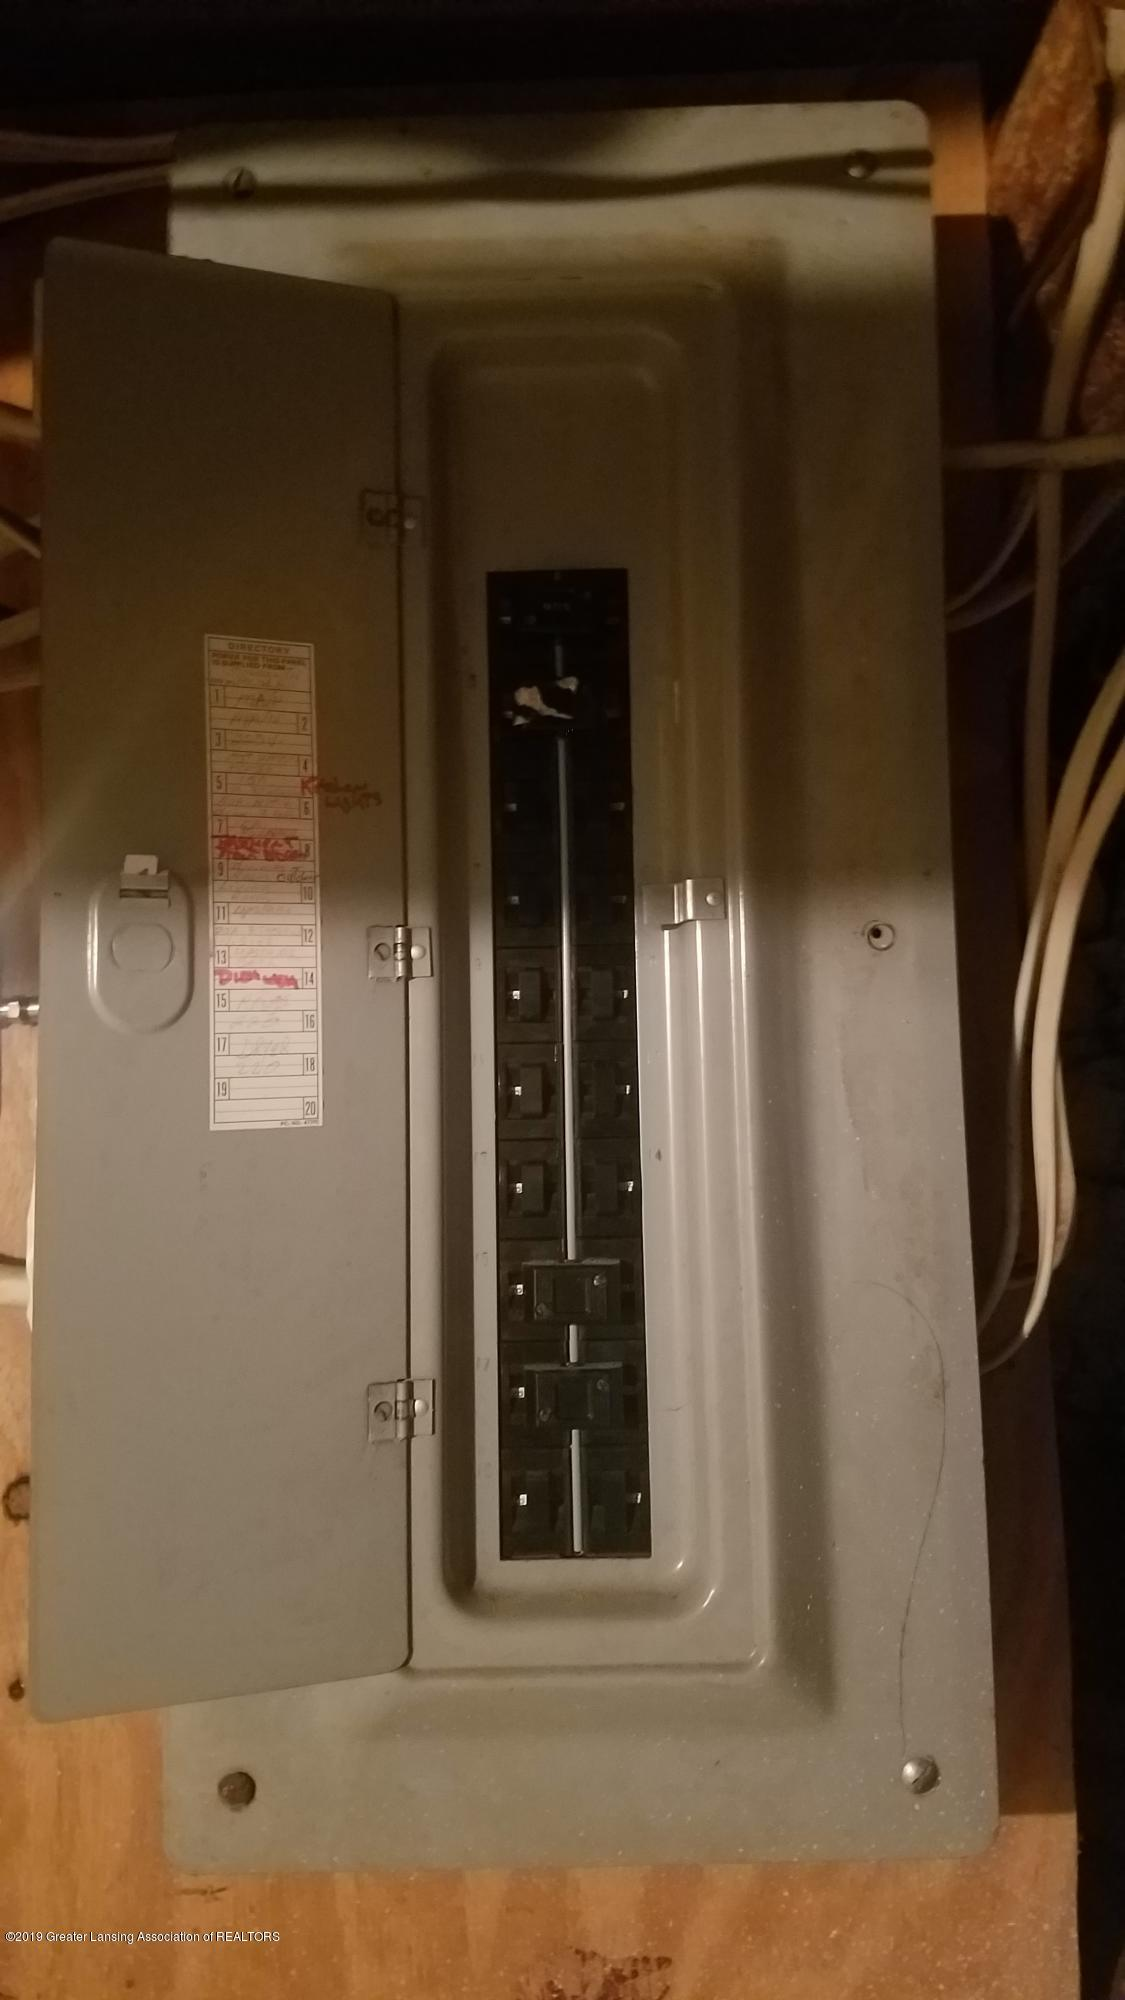 314 N Sheldon St - ELECTRIC PANEL - 20